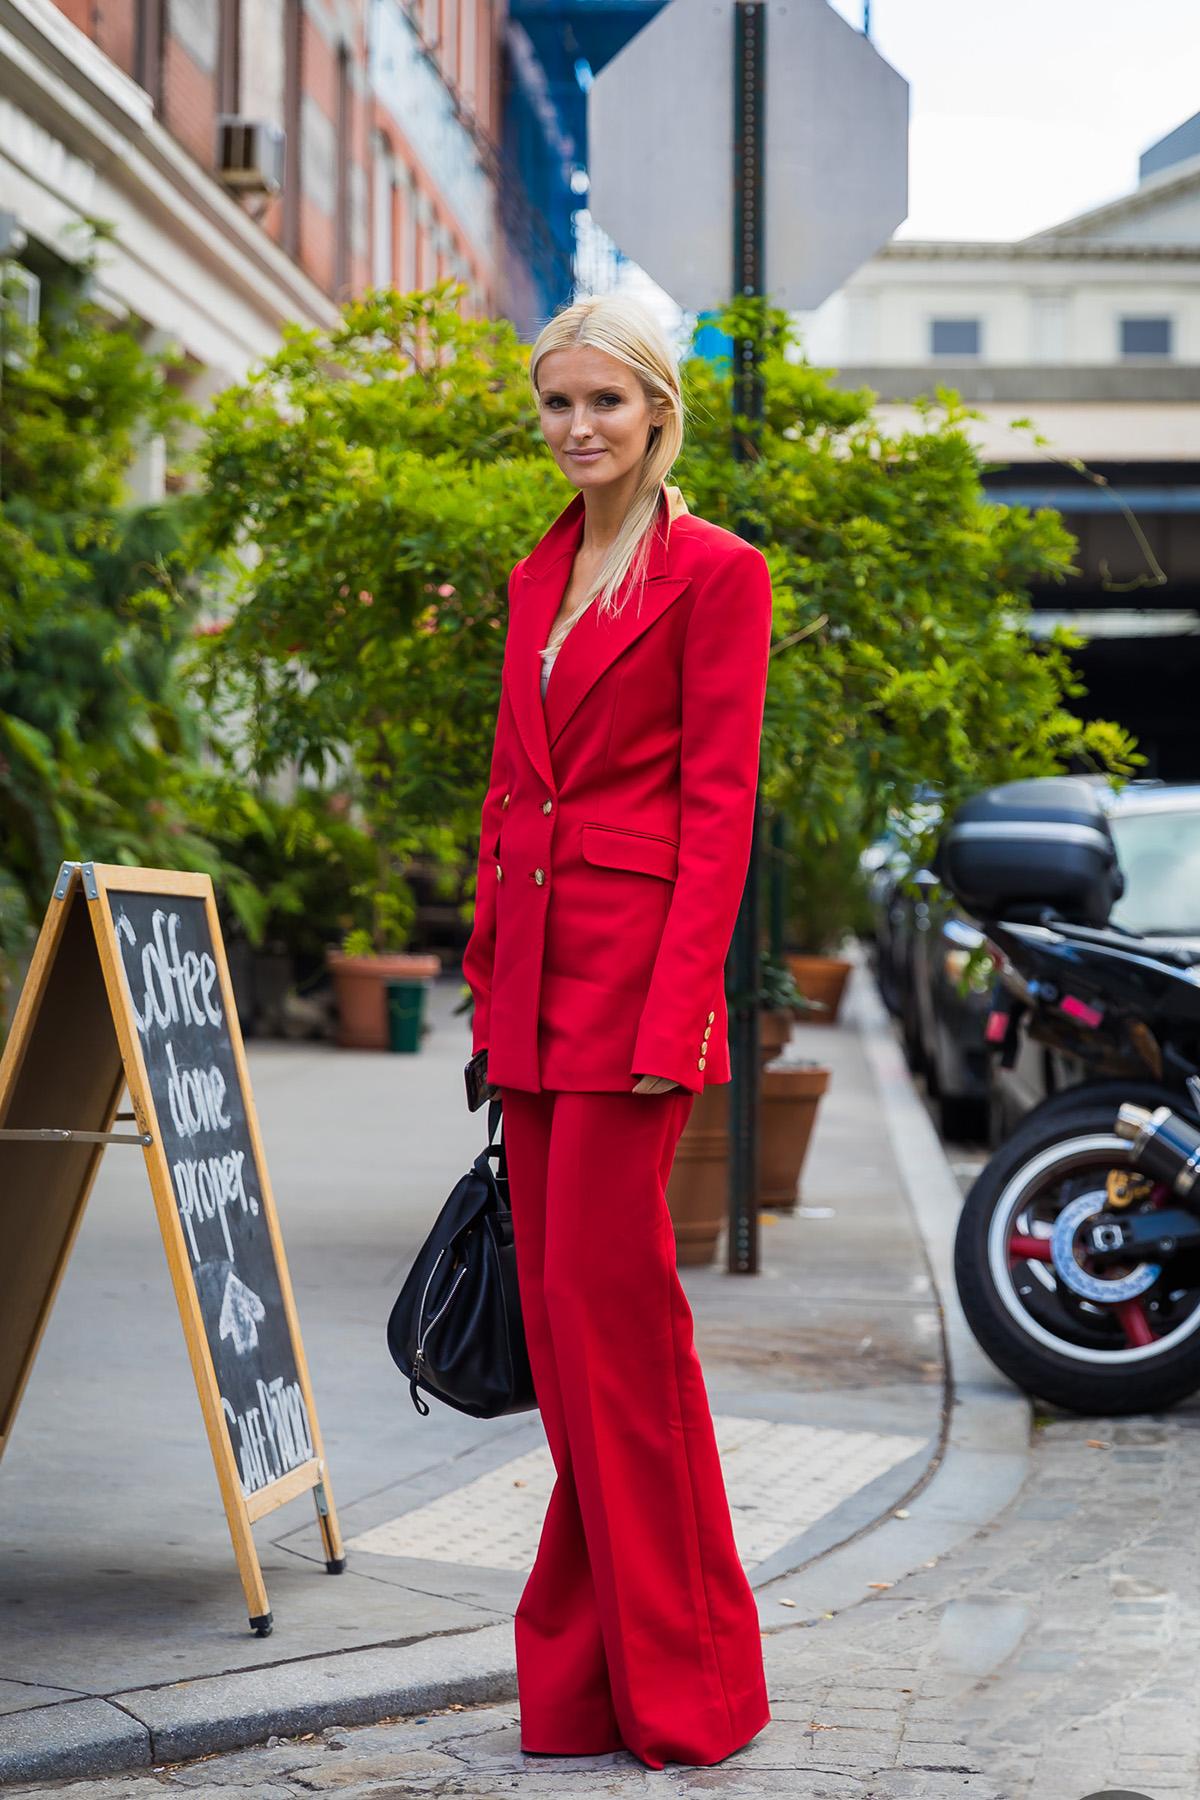 Kate-Davidson-Hudson-by-STYLEDUMONDE-Street-Style-Fashion-Photography_48A0262